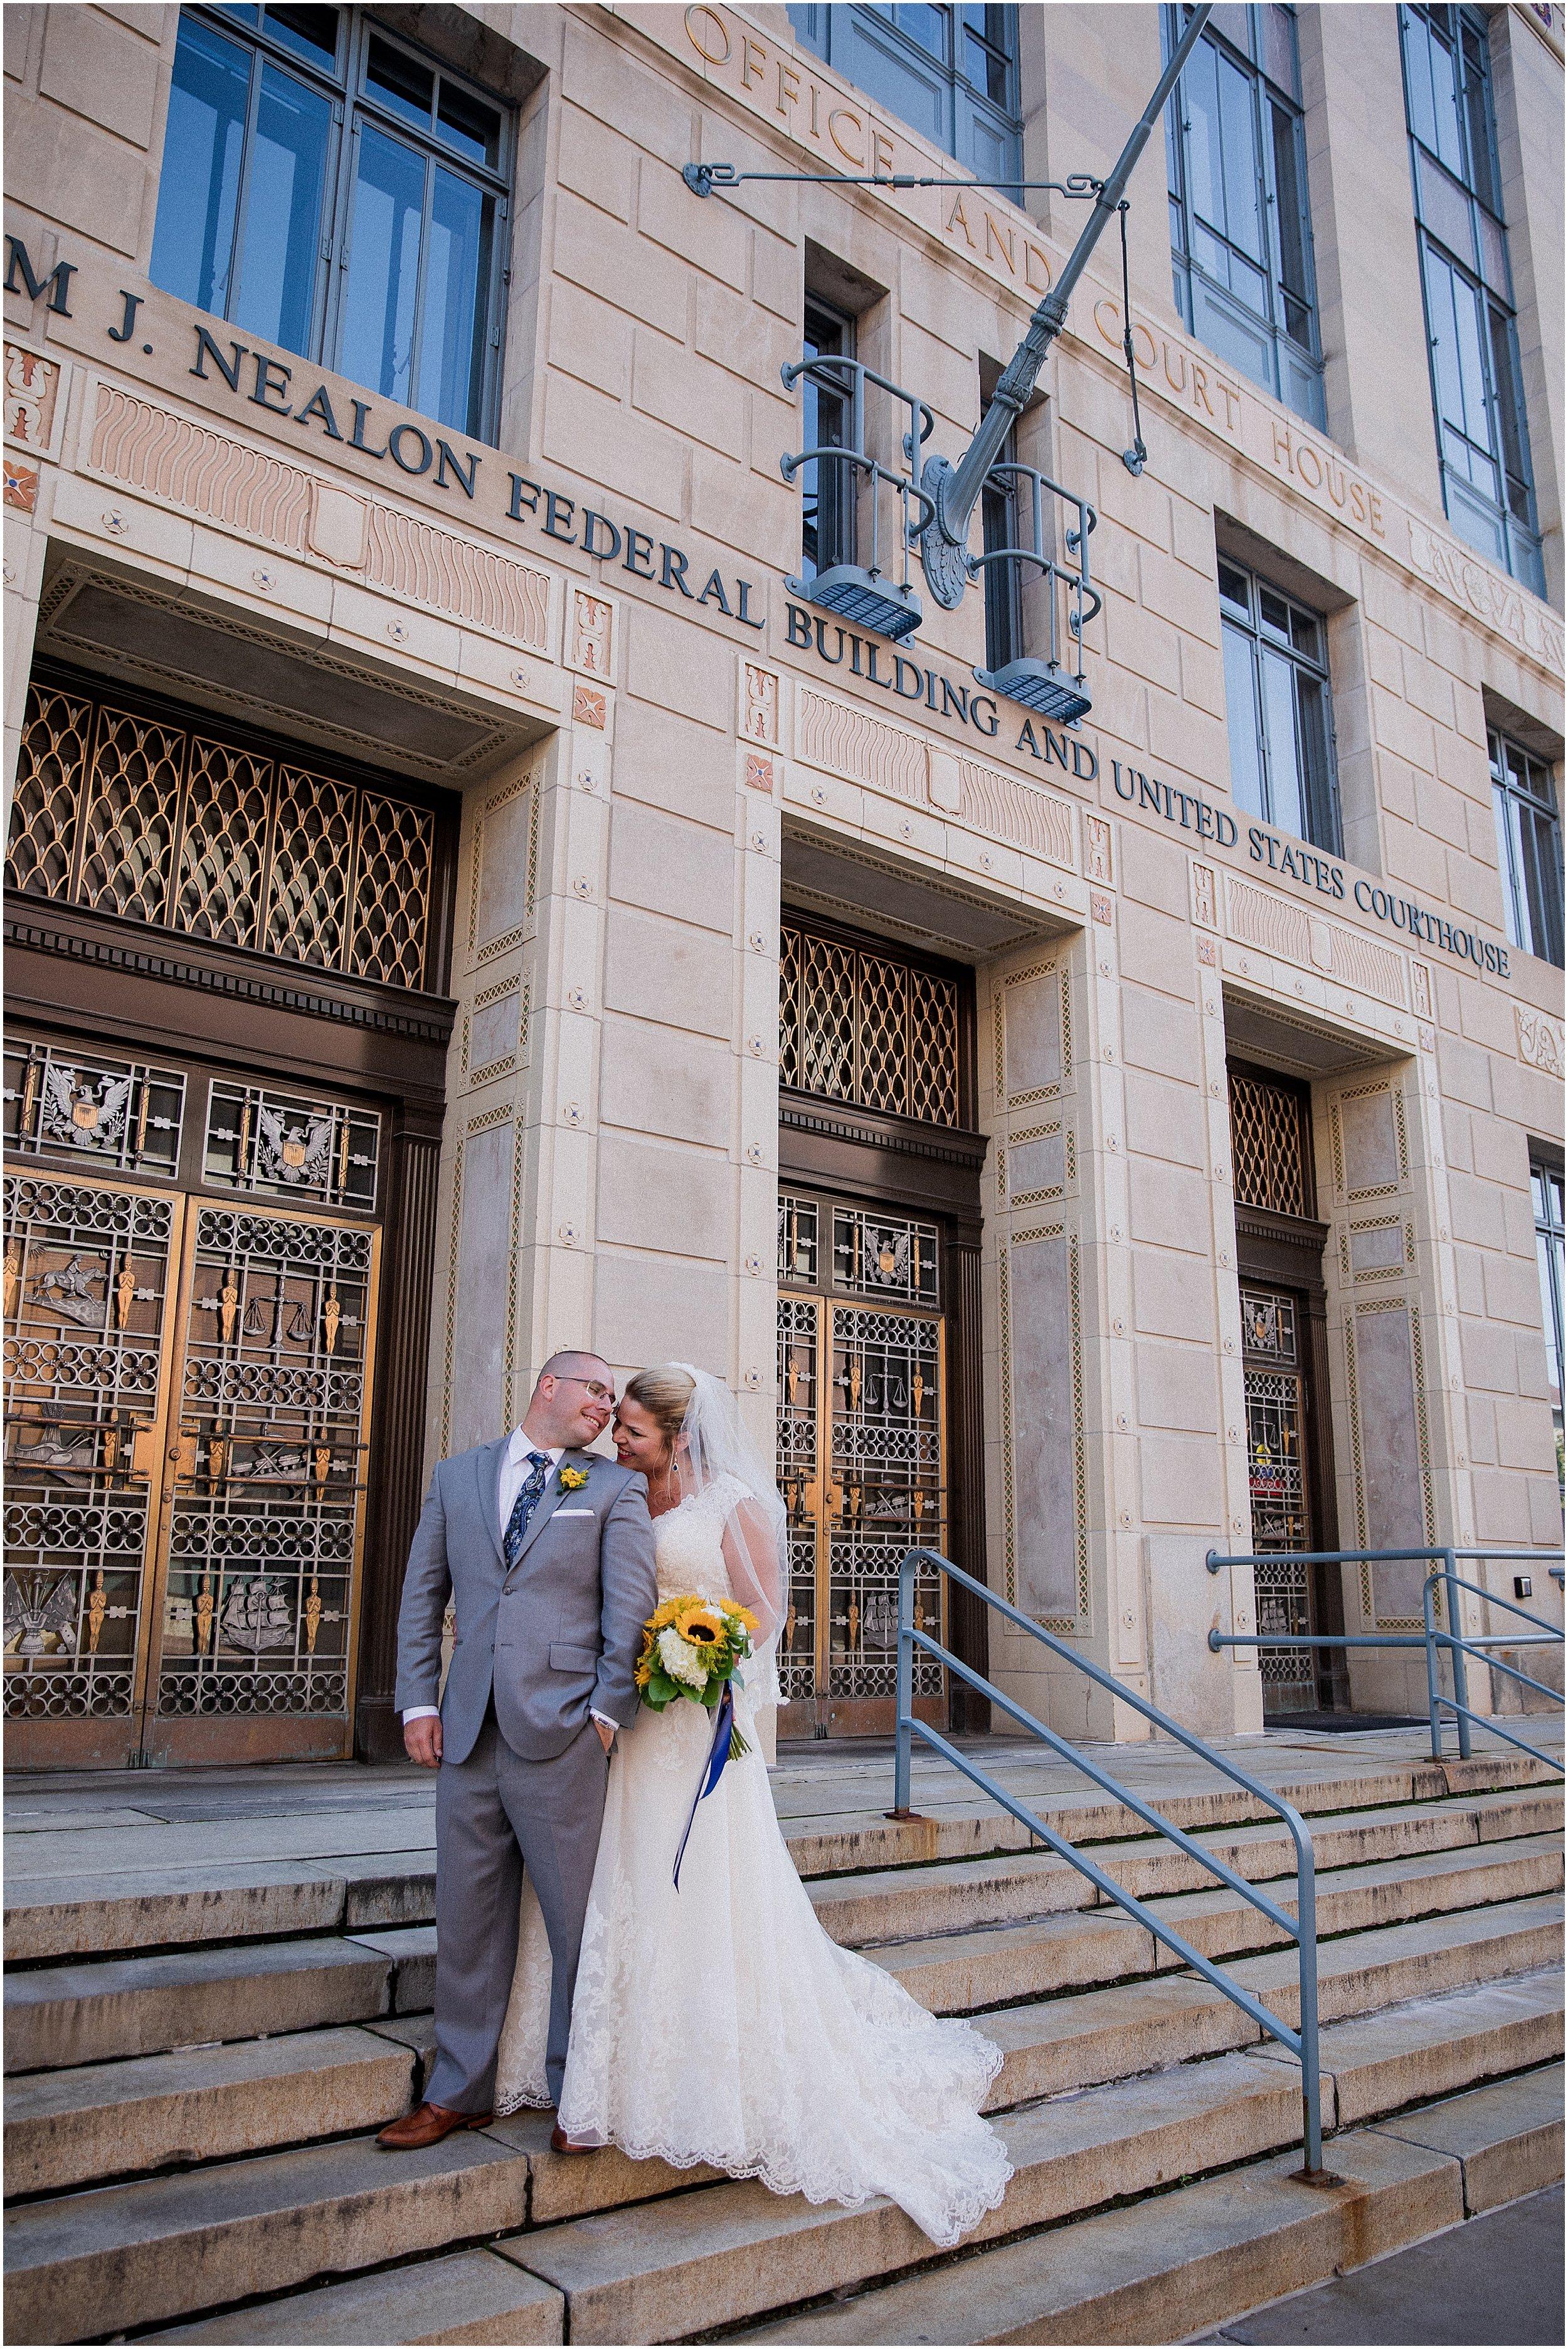 Scranton_Wedding_0118.jpg